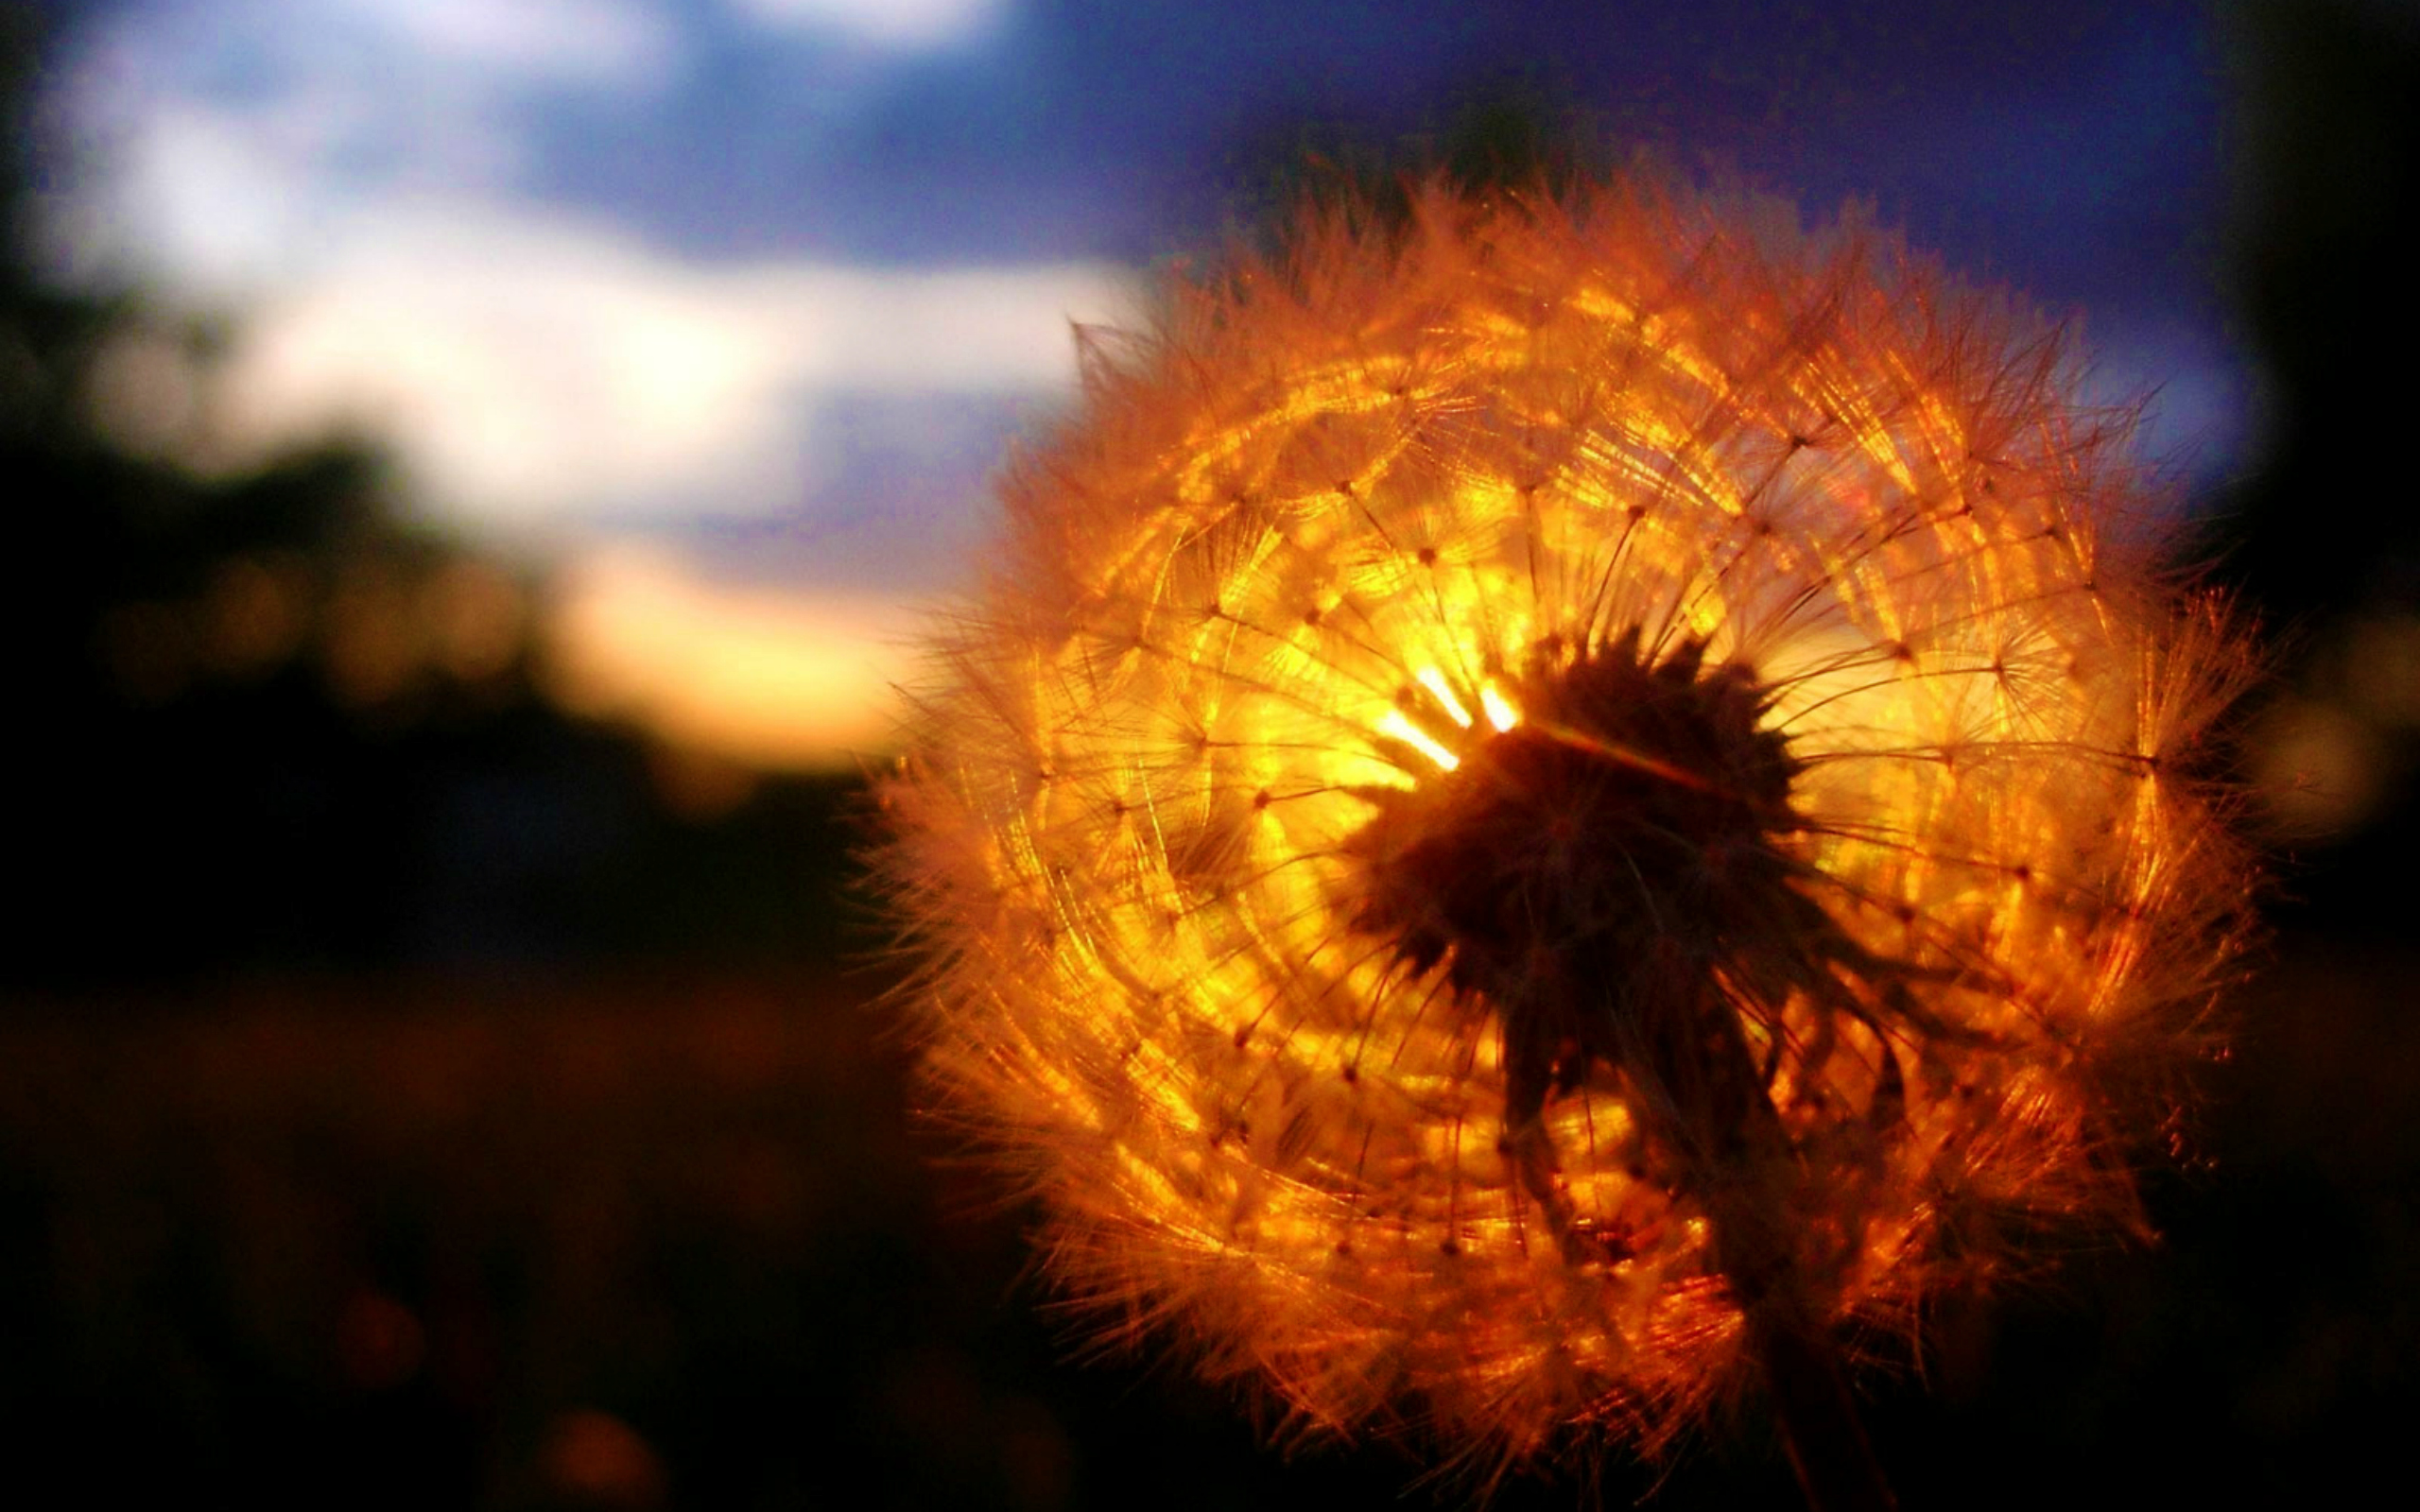 Dandelion amazing sunset hd nature 4k wallpapers images - Dandelion hd wallpapers 1080p ...